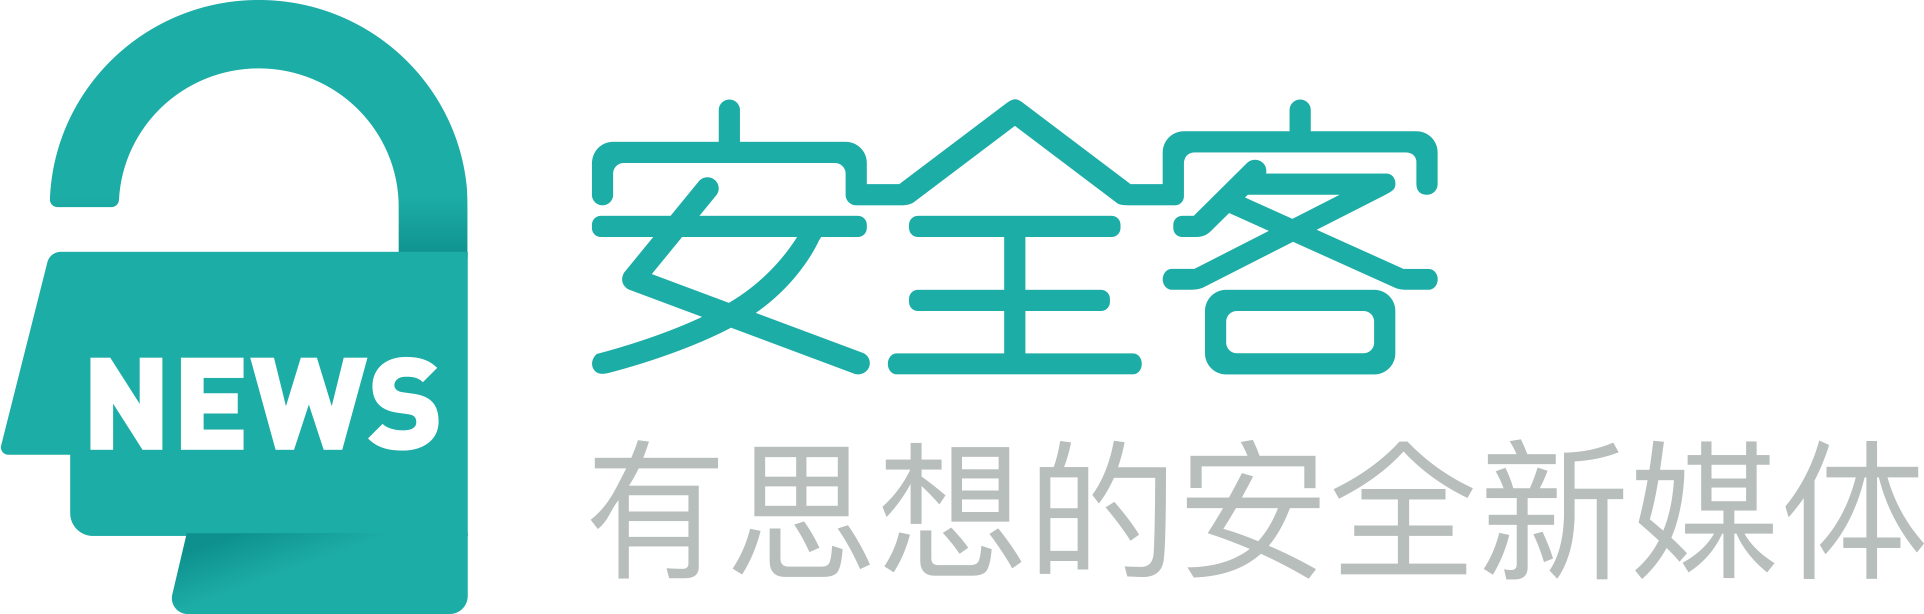 安全客Logo